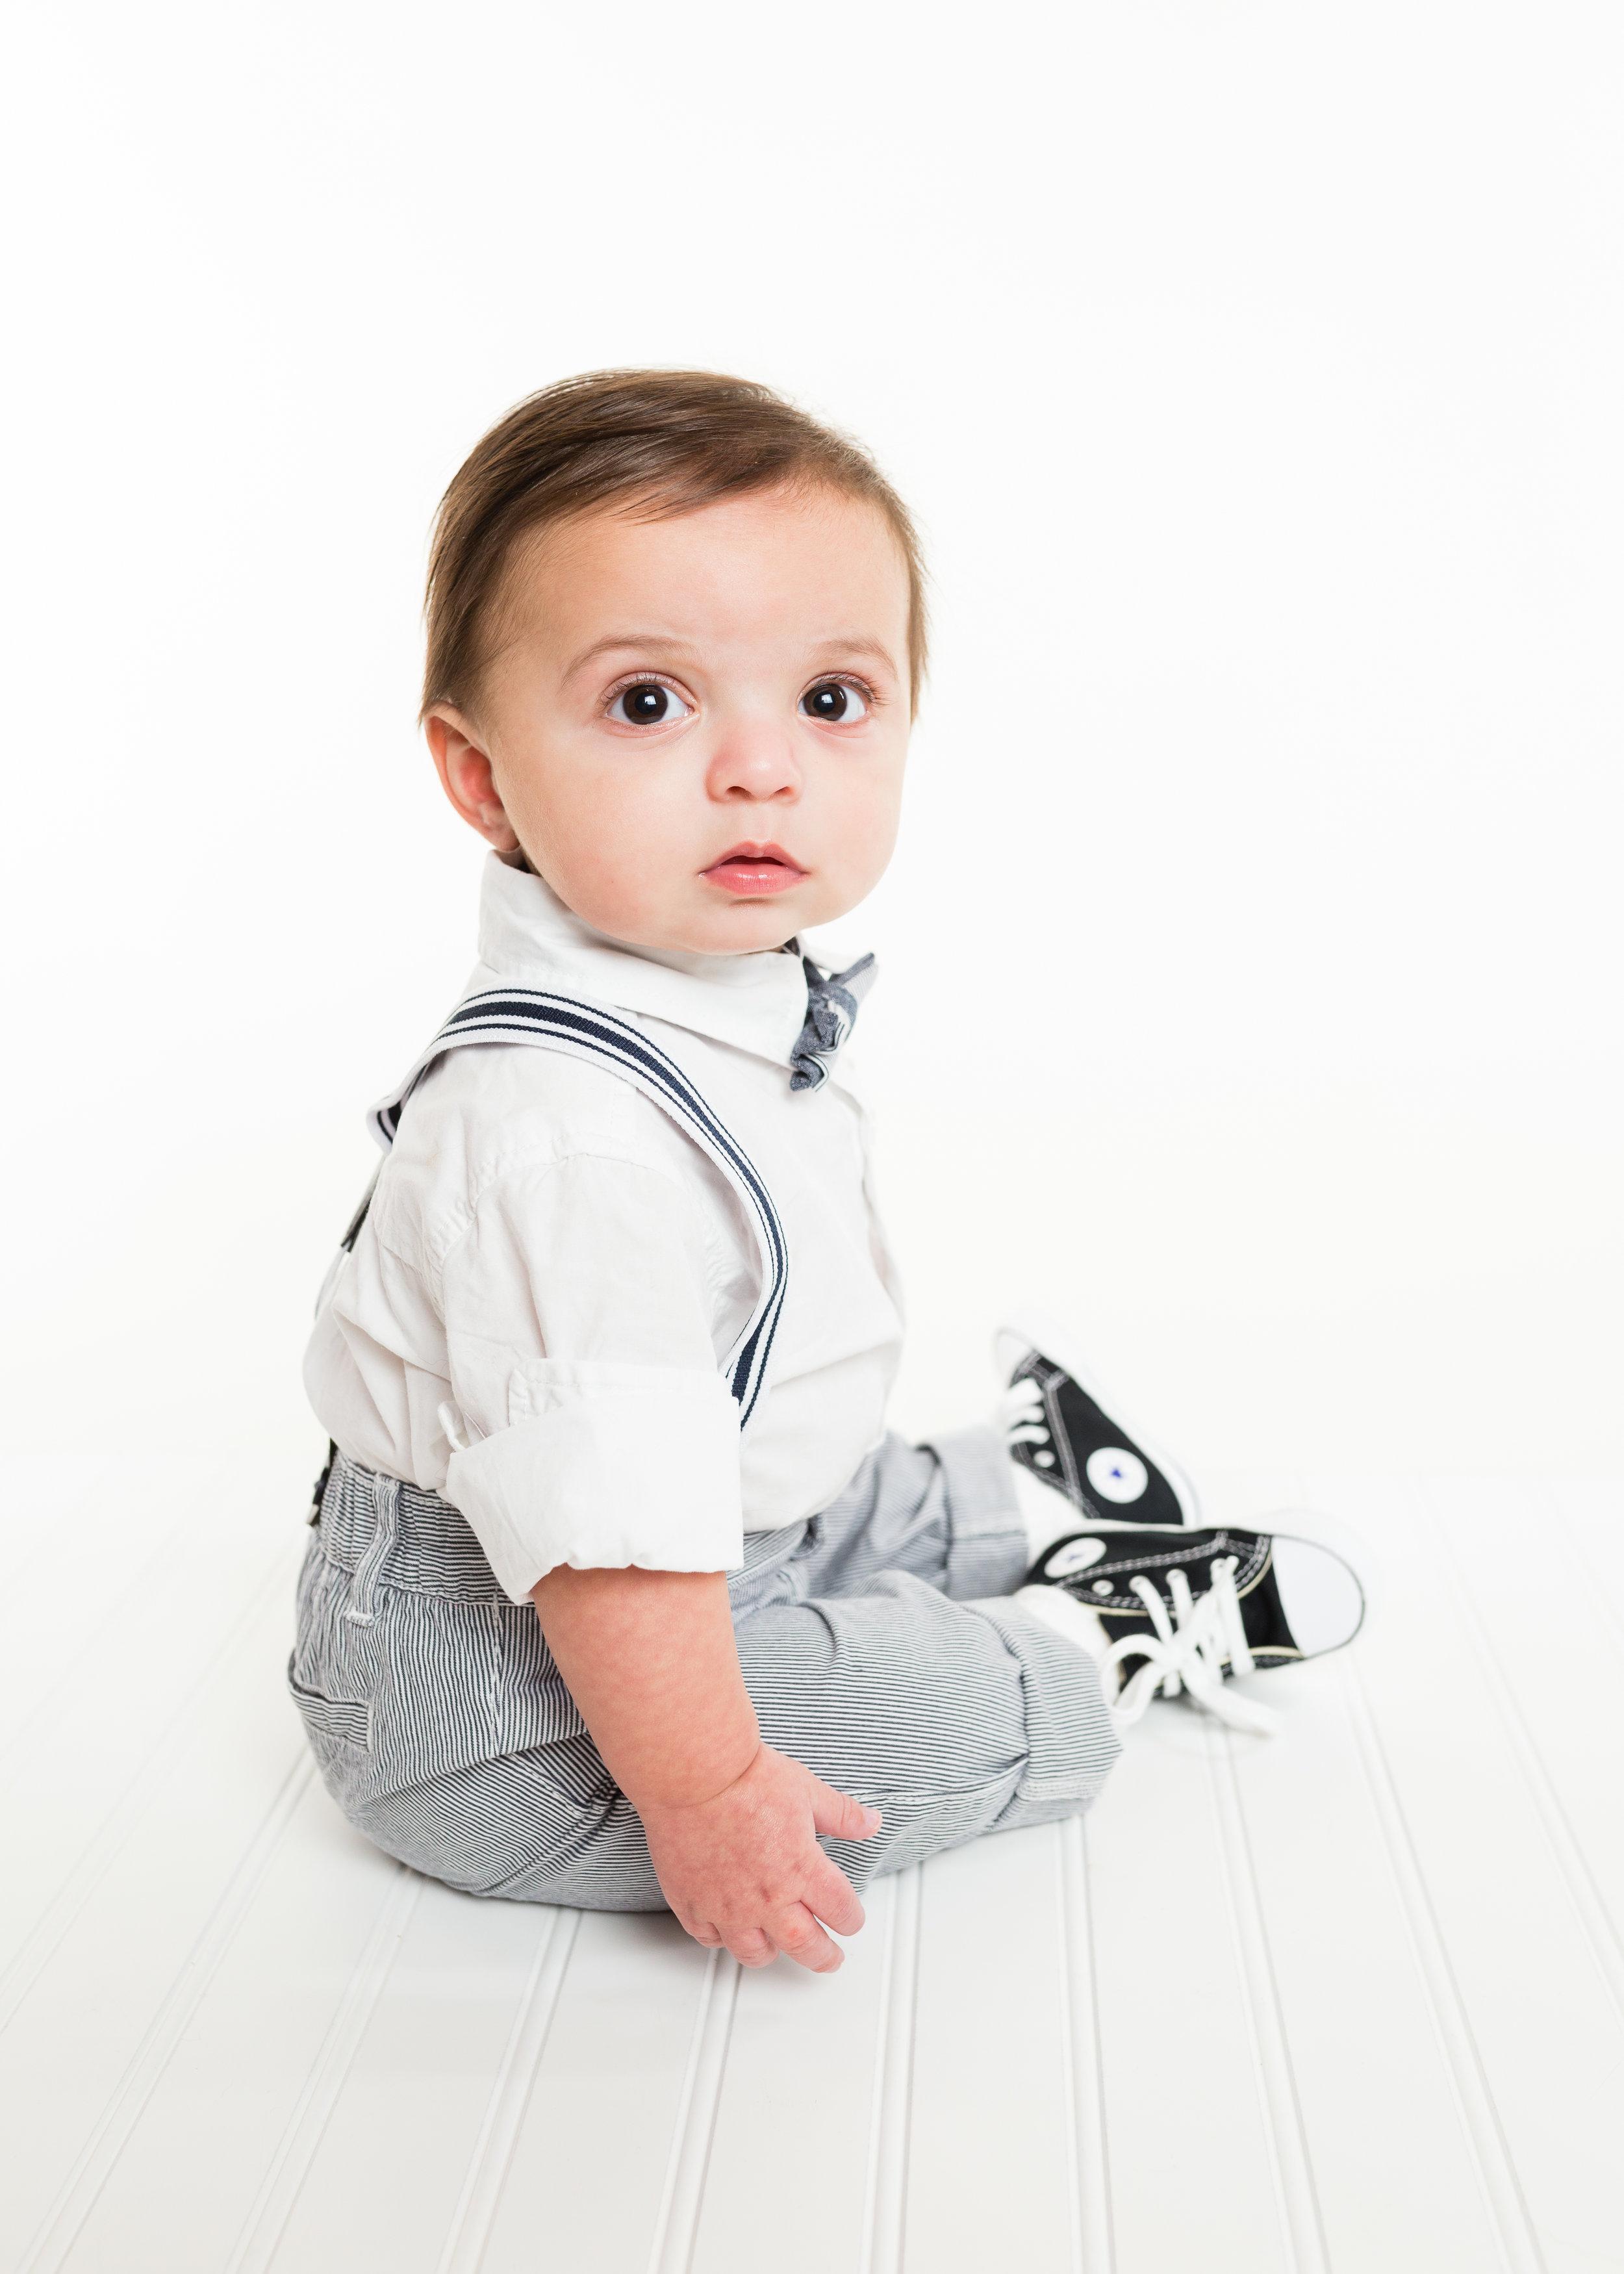 Family-child-portrait-lafayette-broussard-youngsville-photographer-2-4.jpg